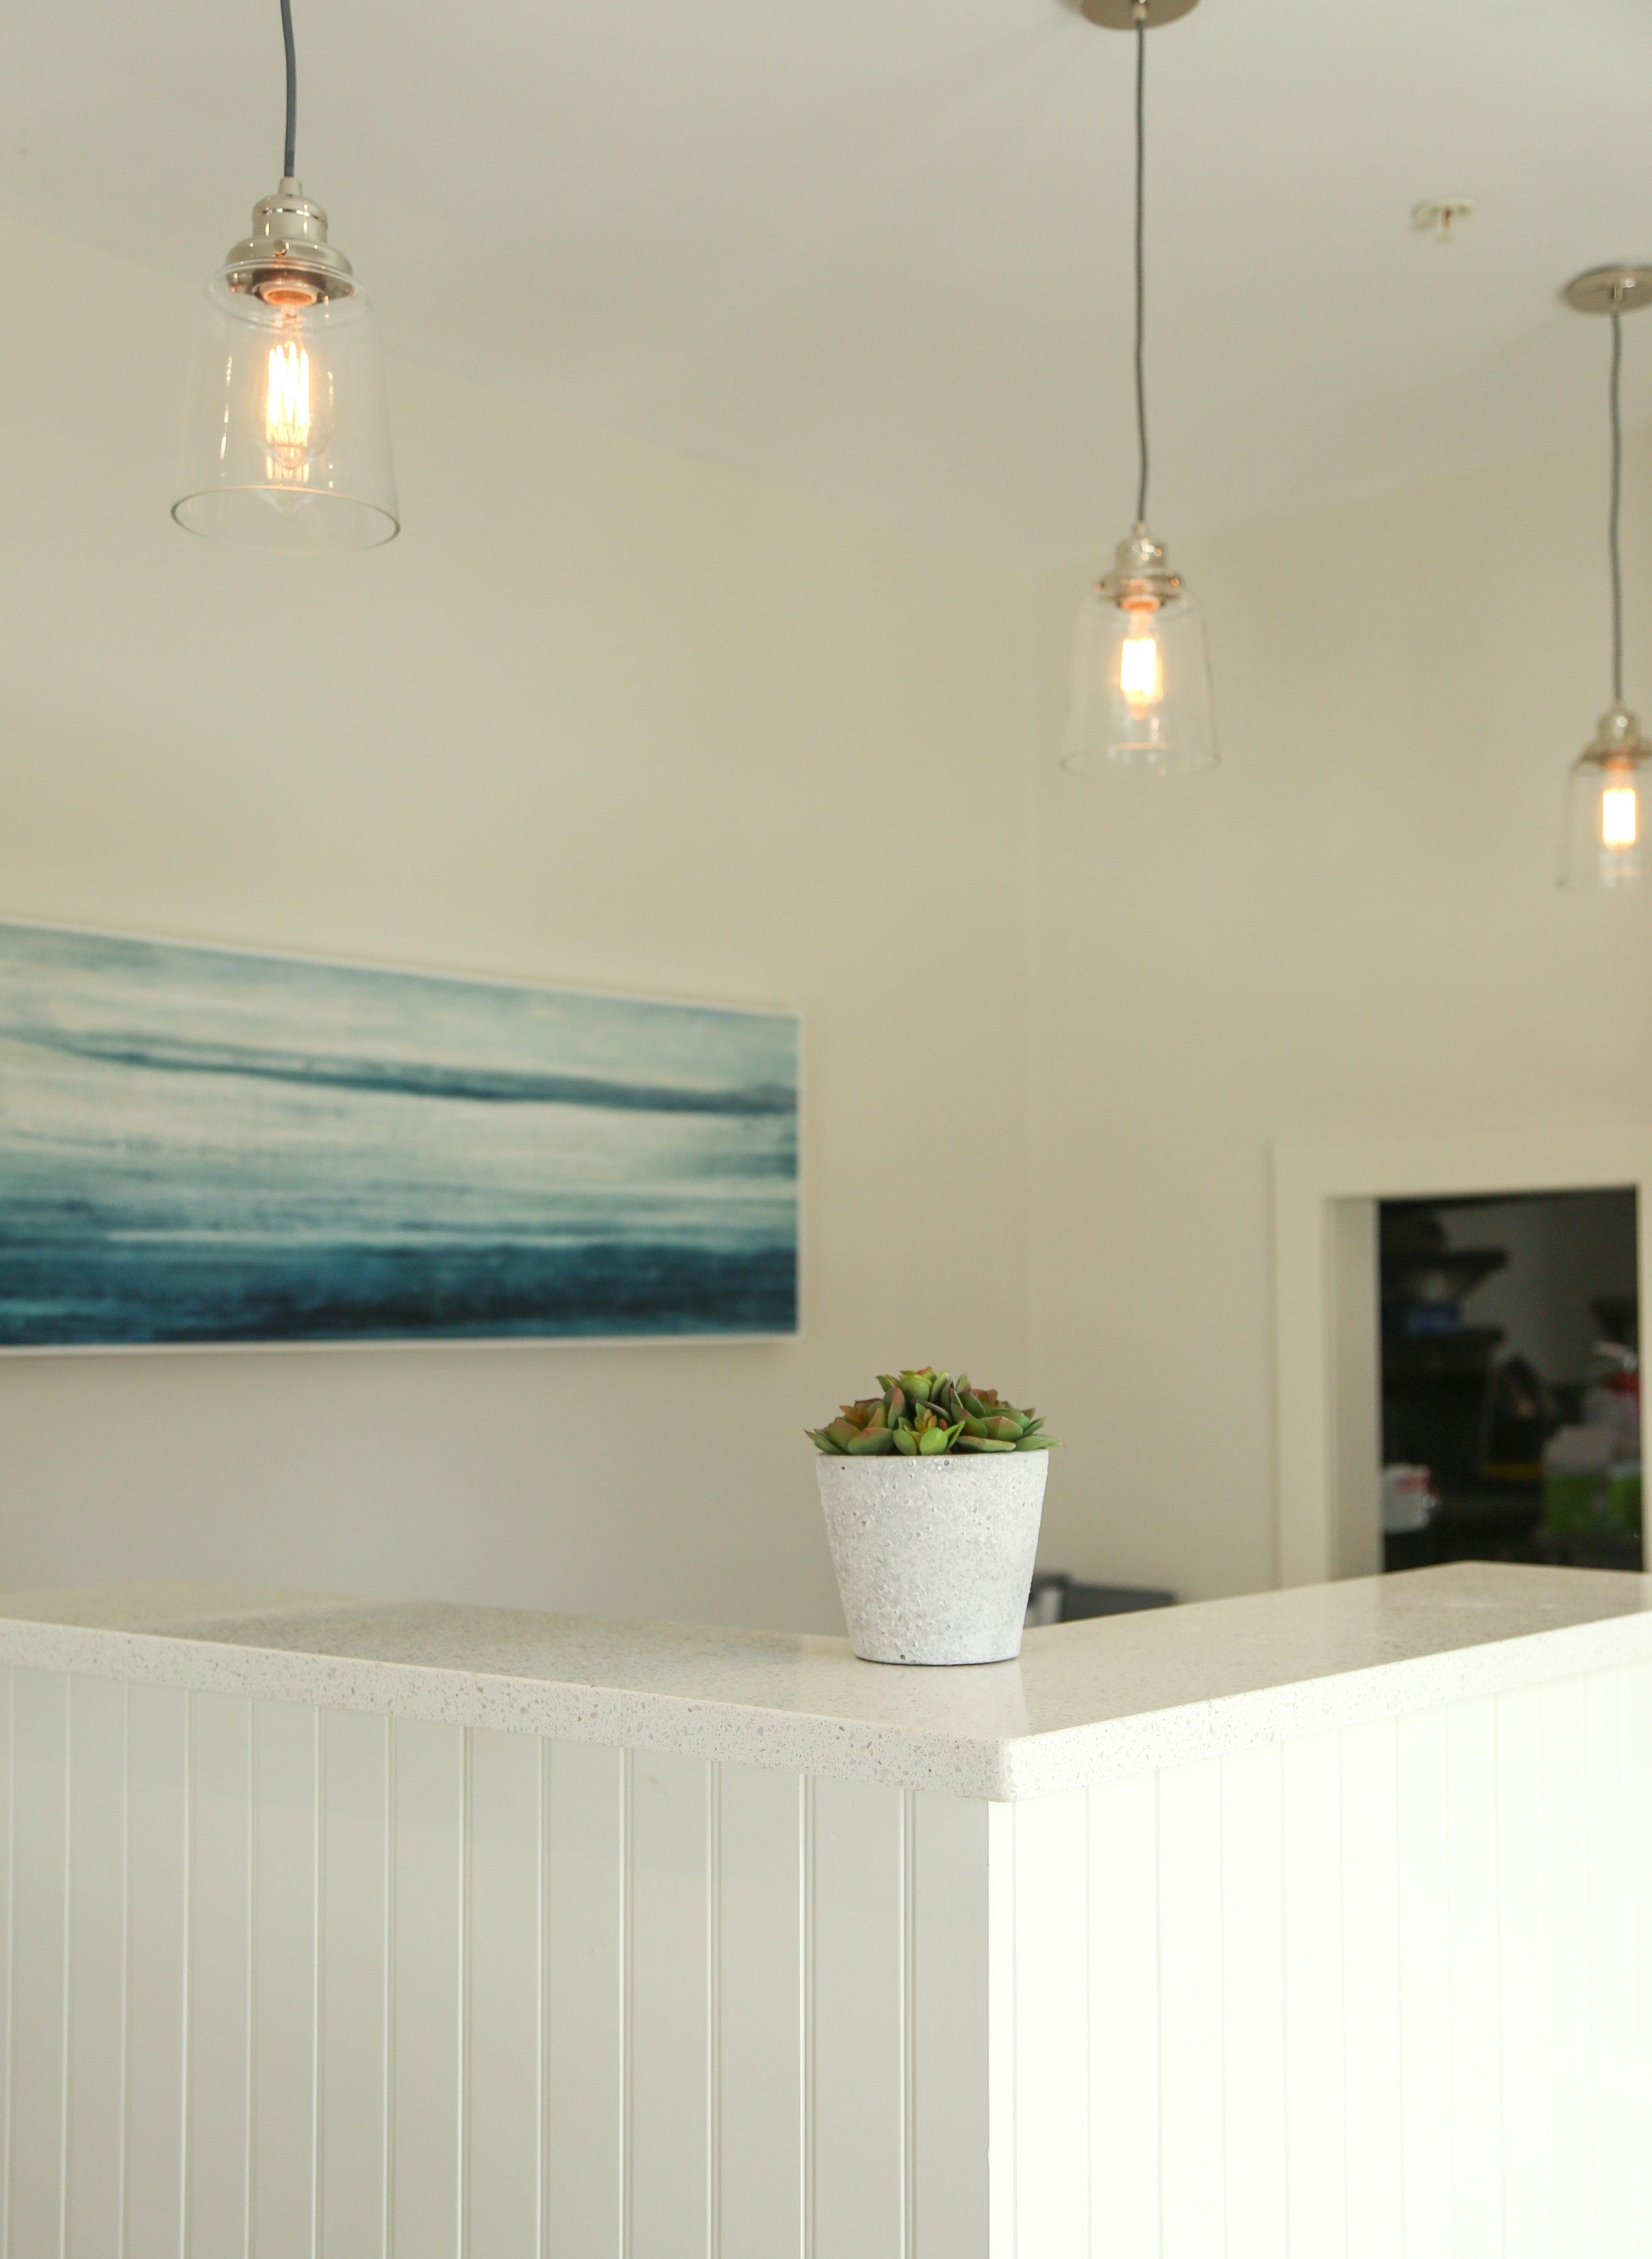 Sea Breeze Inn (17 of 292) copy 2.jpg